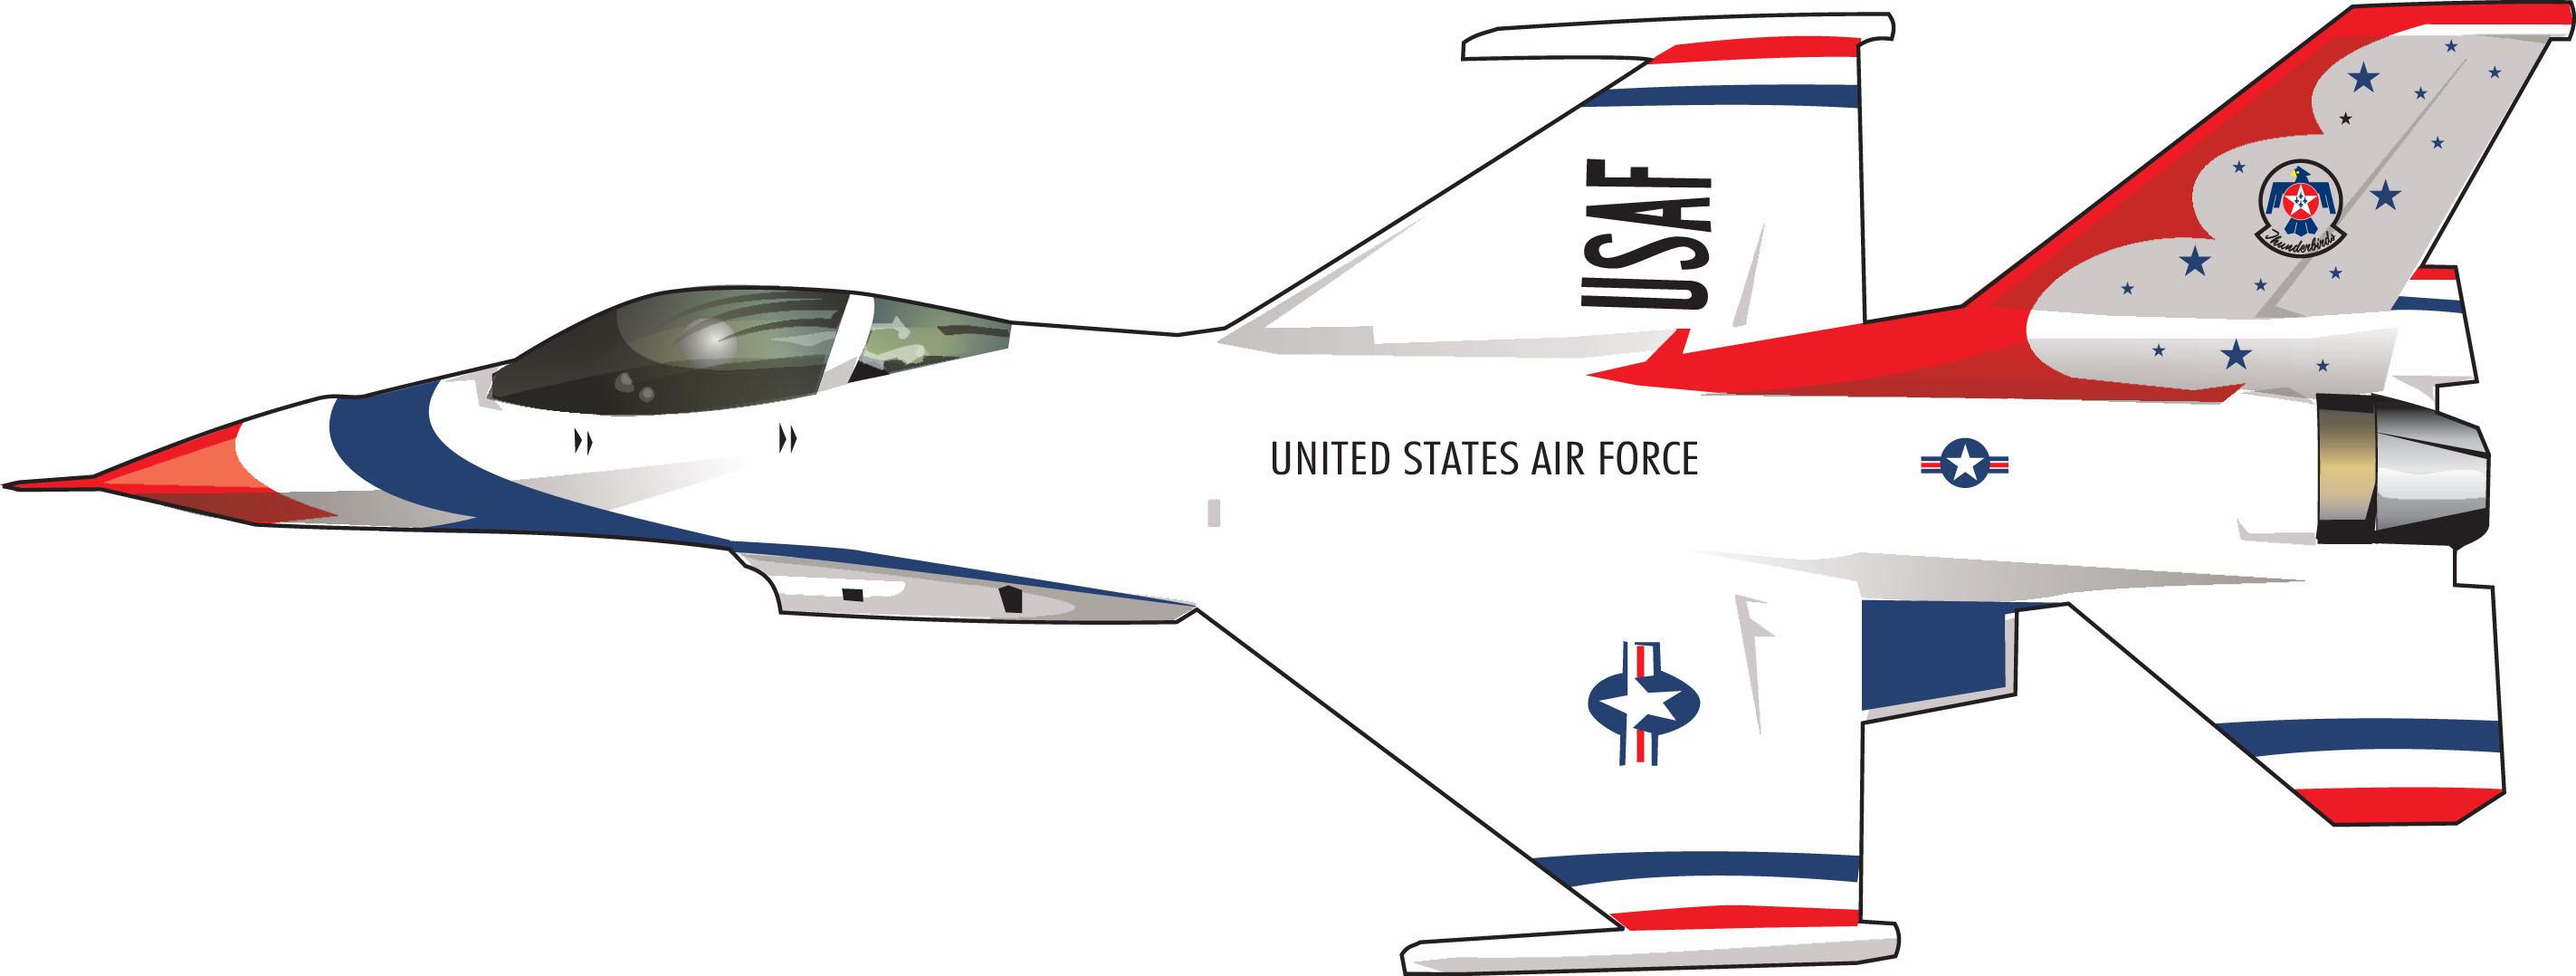 Art f fighting falcon. 3 clipart thunderbird